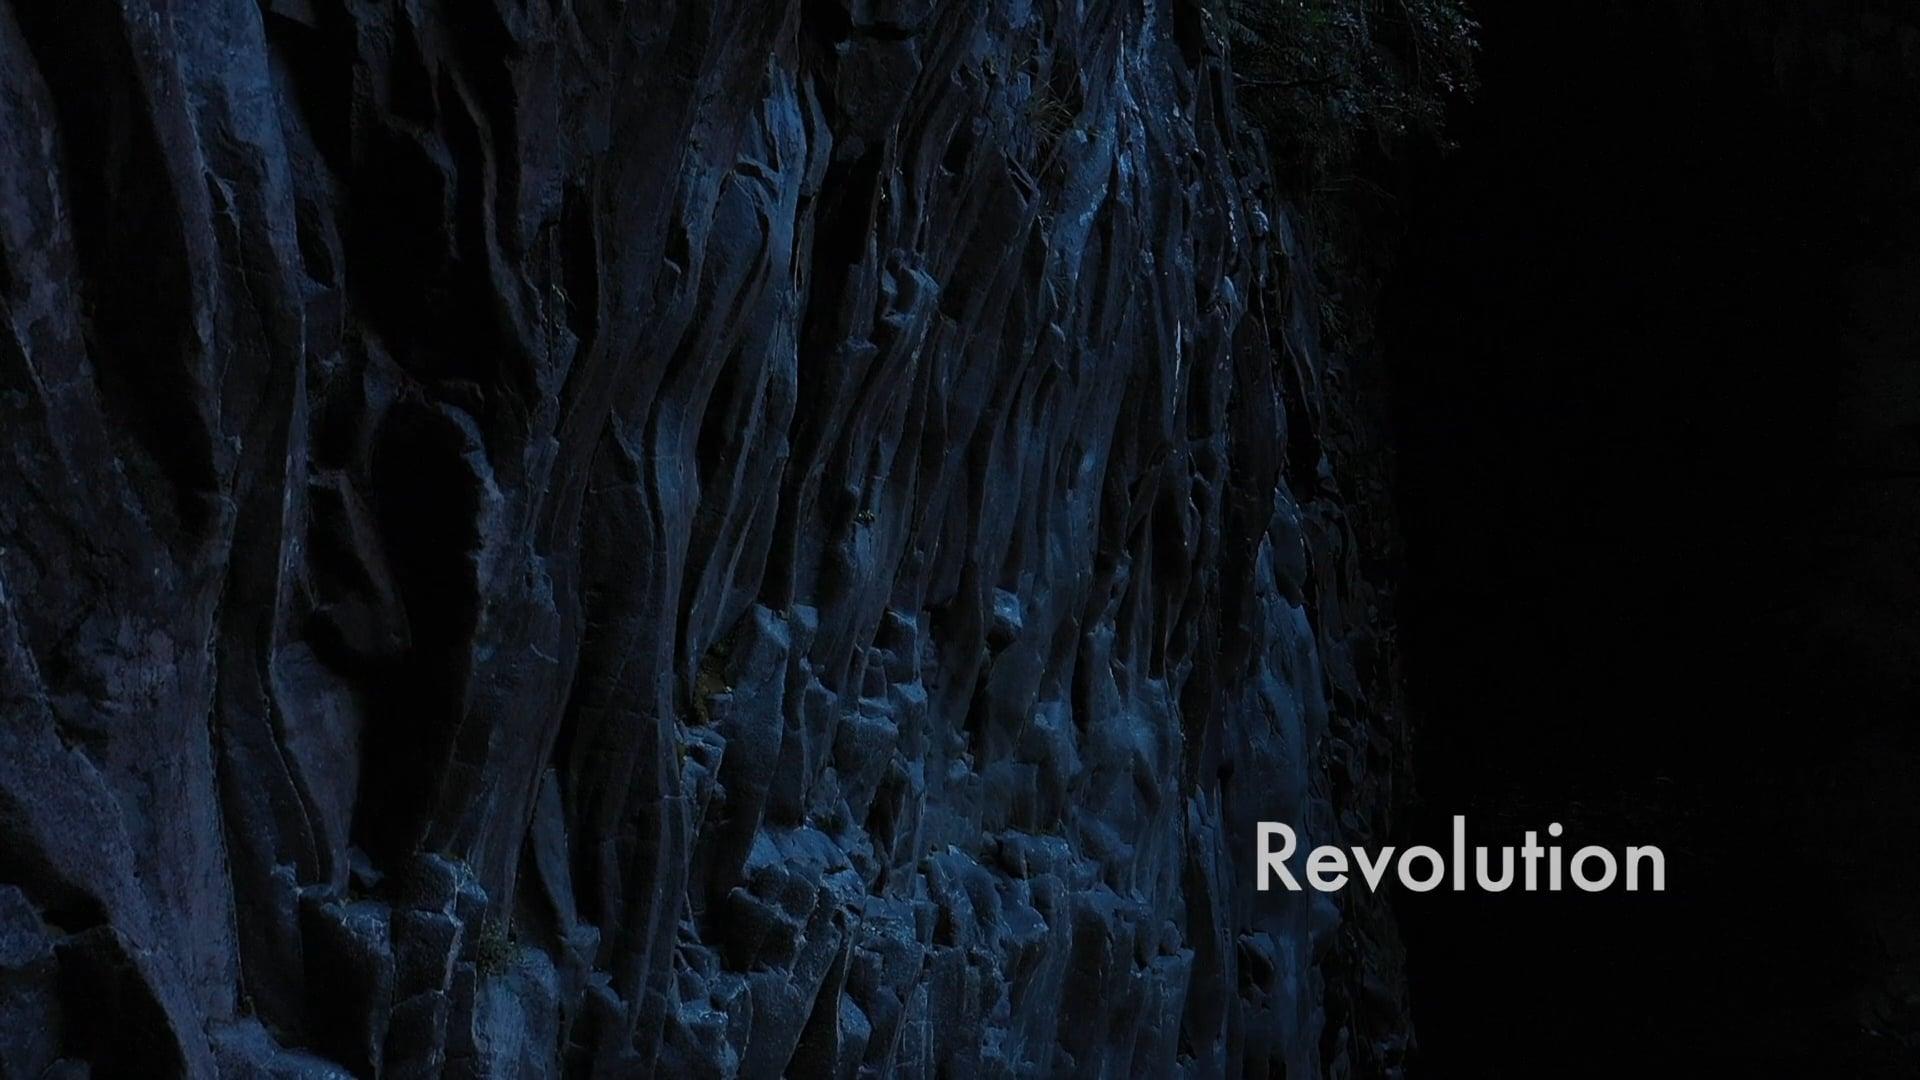 Ep 4: Revolution